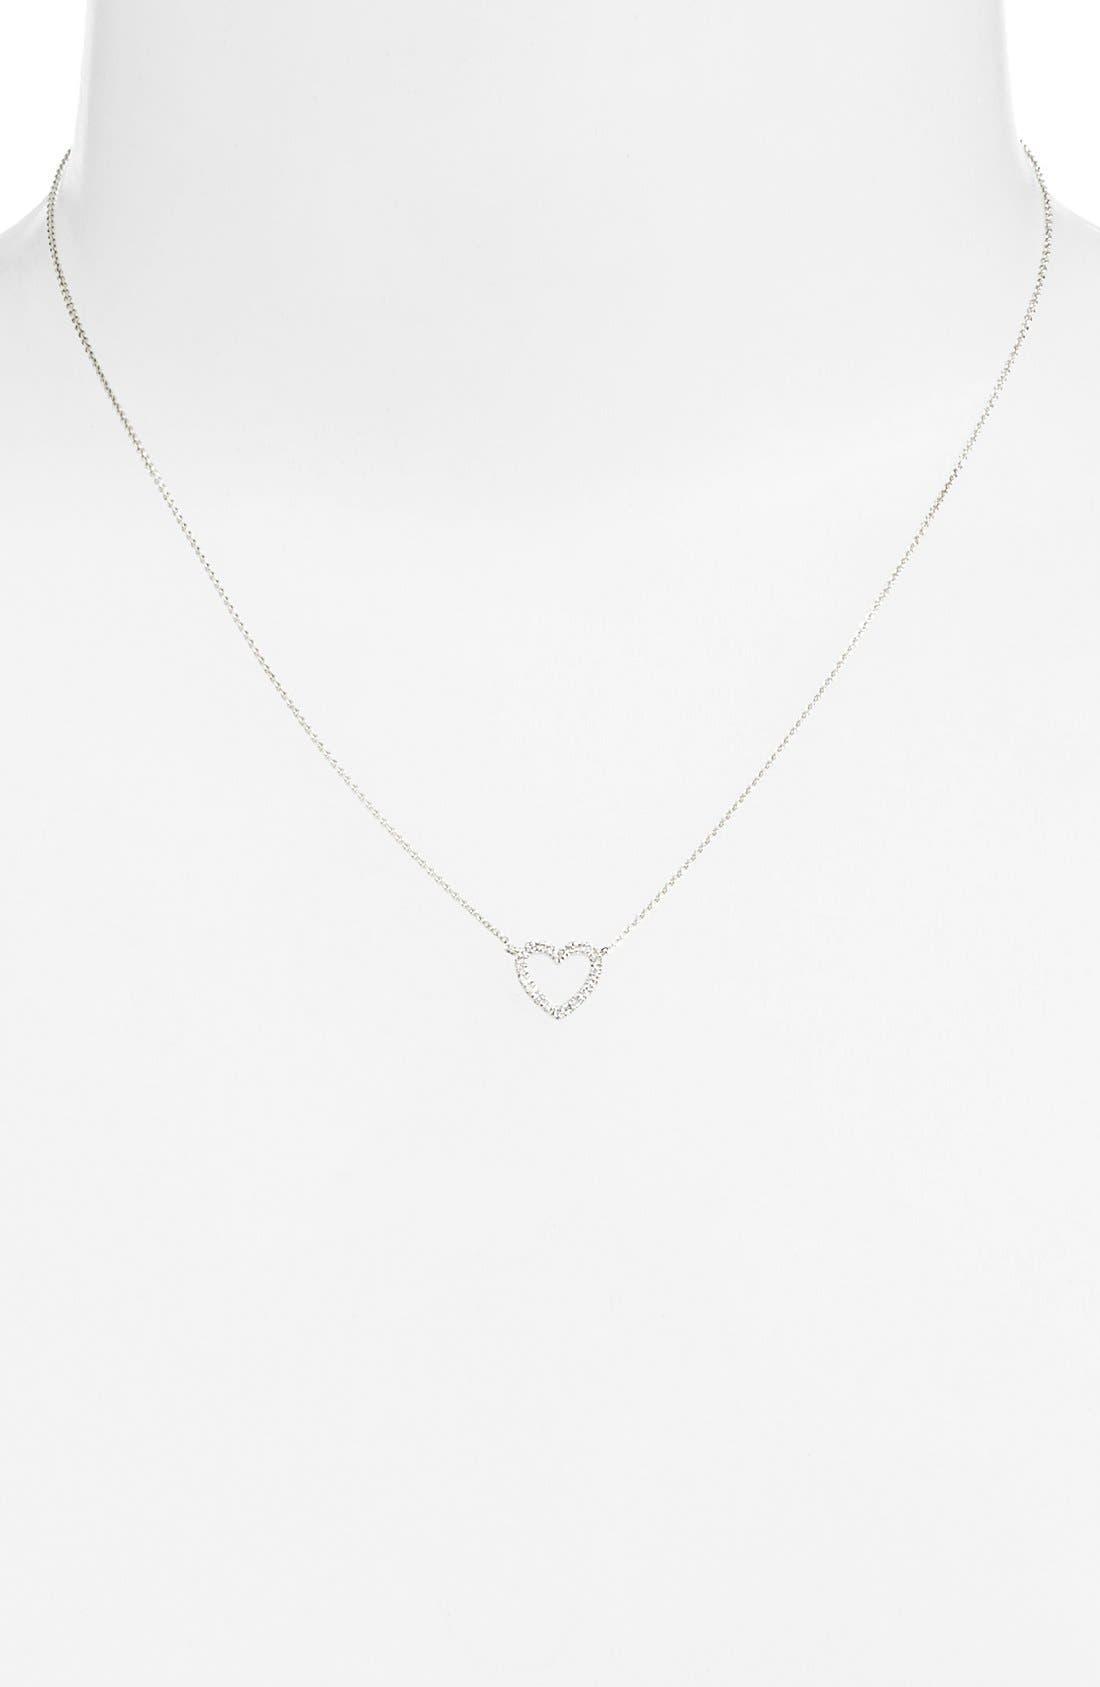 Diamond Heart Pendant Necklace,                             Alternate thumbnail 6, color,                             710